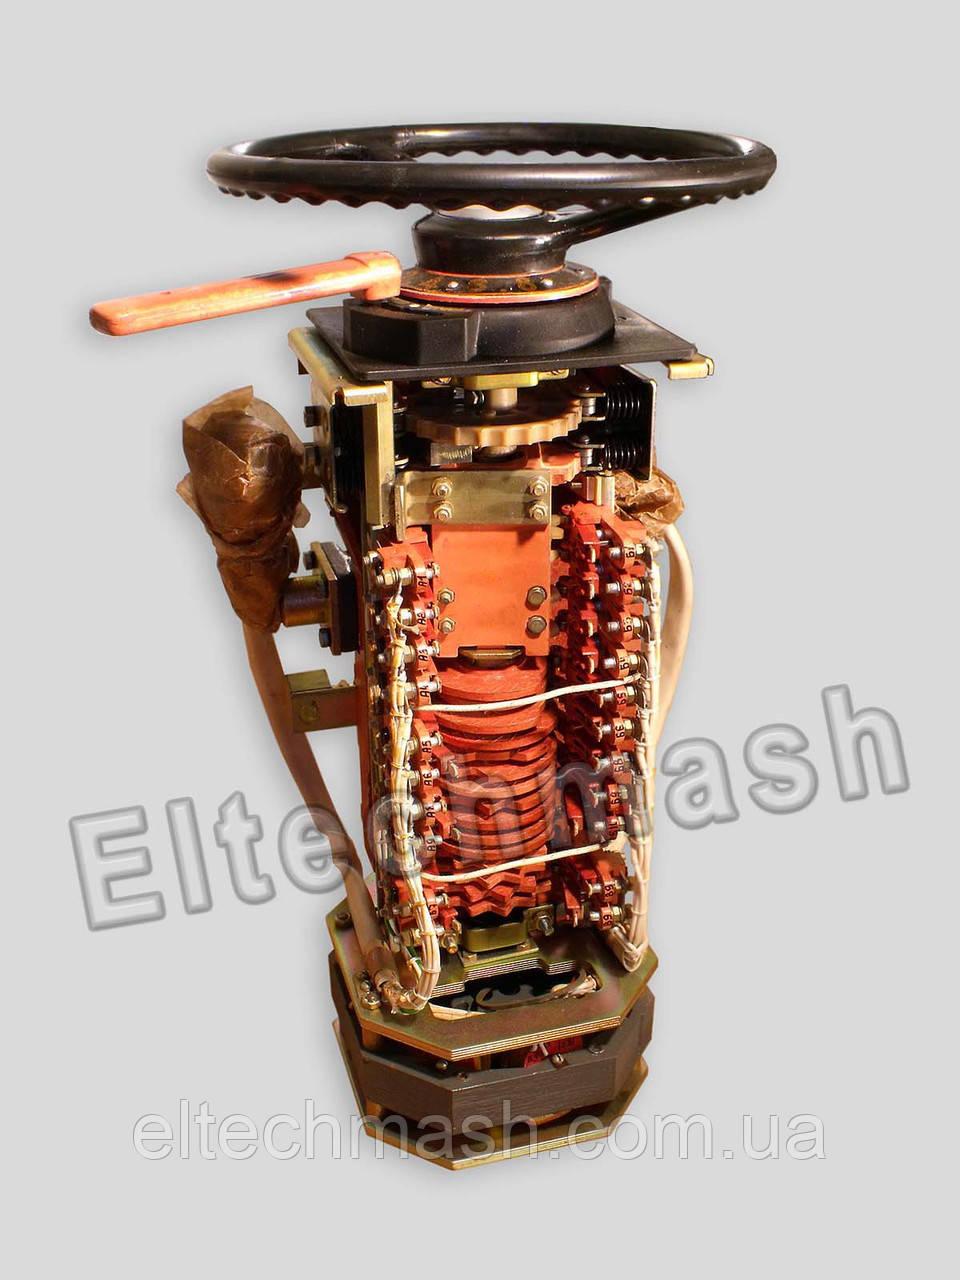 Контроллер КМ-2105У3, ИАКВ.643122.001-12